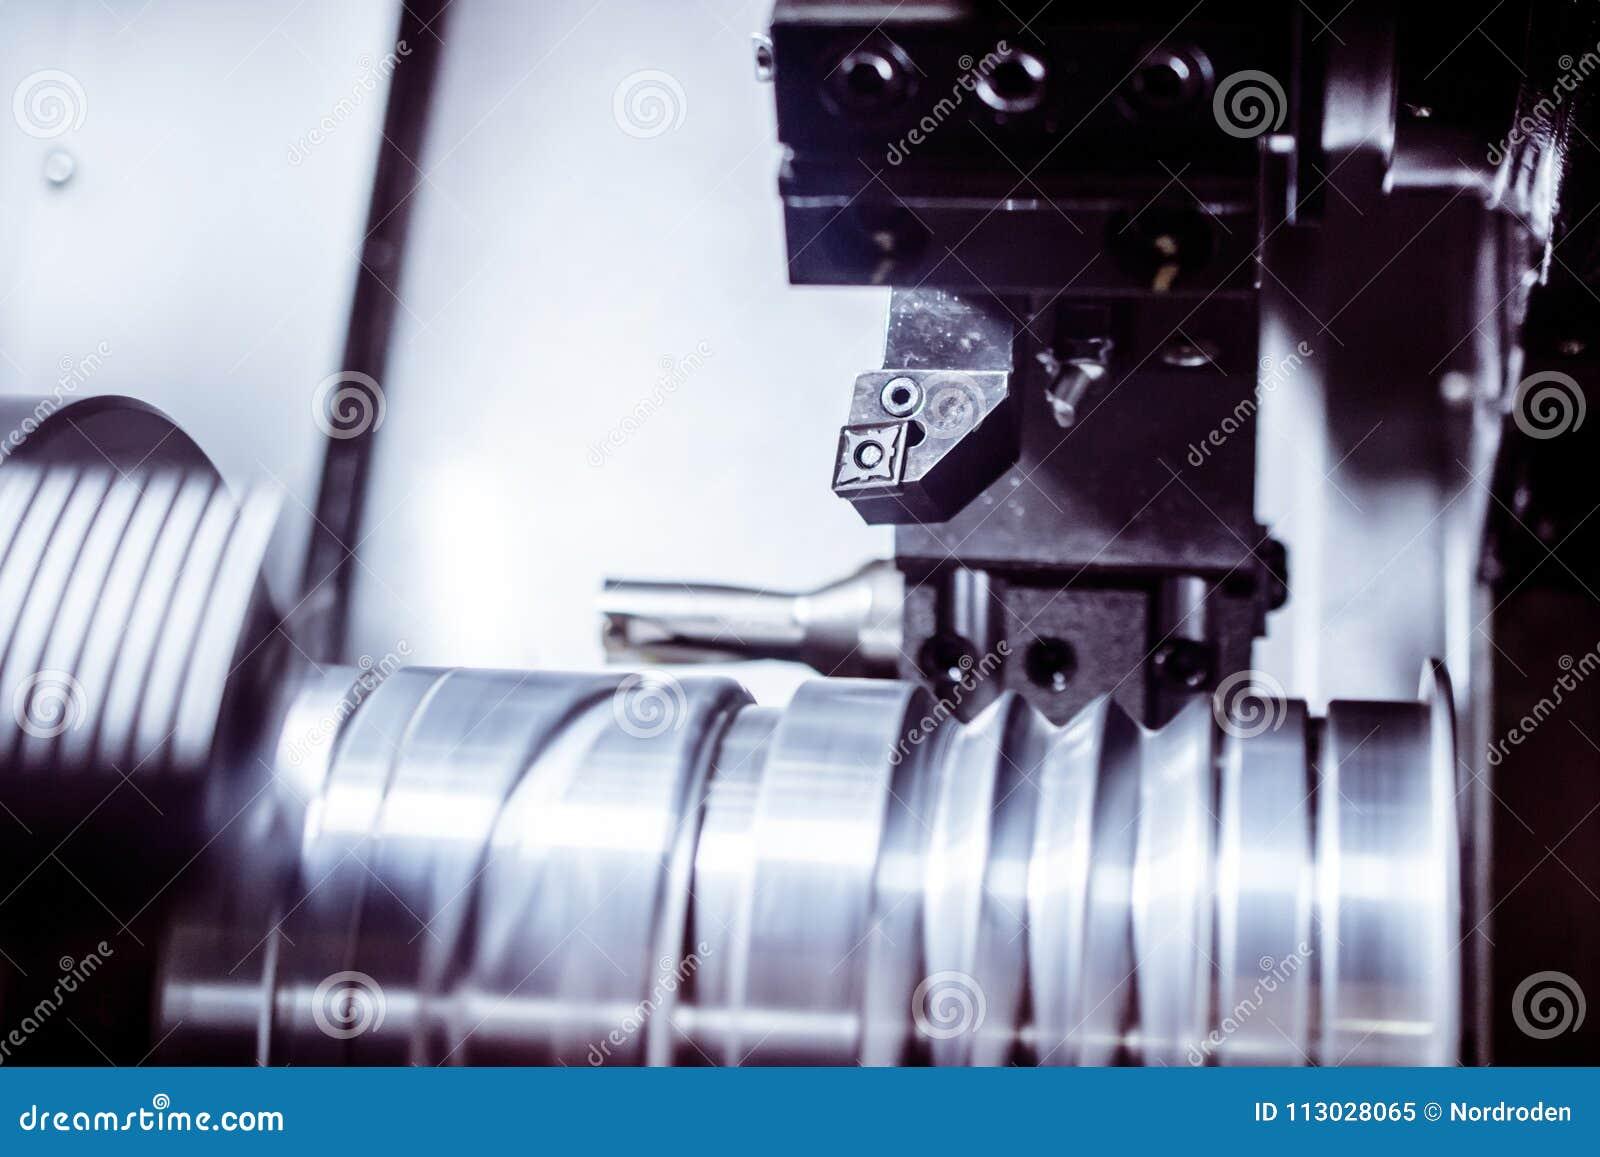 Objeto del metal afianzado con abrazadera en la máquina del CNC de la tirada del torno